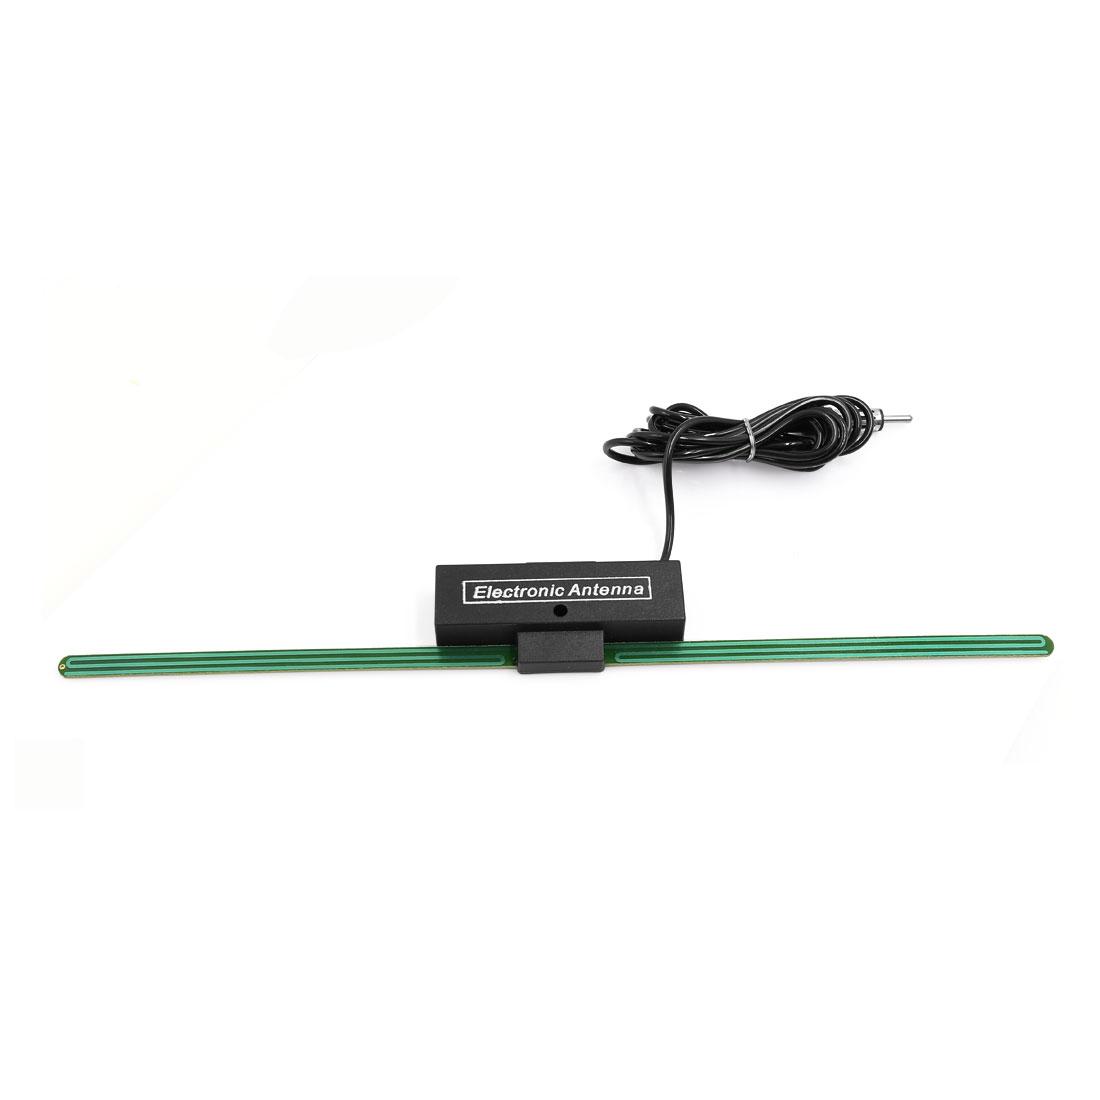 Auto Car Windshield Mounted Self Adhesive Base TV FM Radio Electronic Antenna